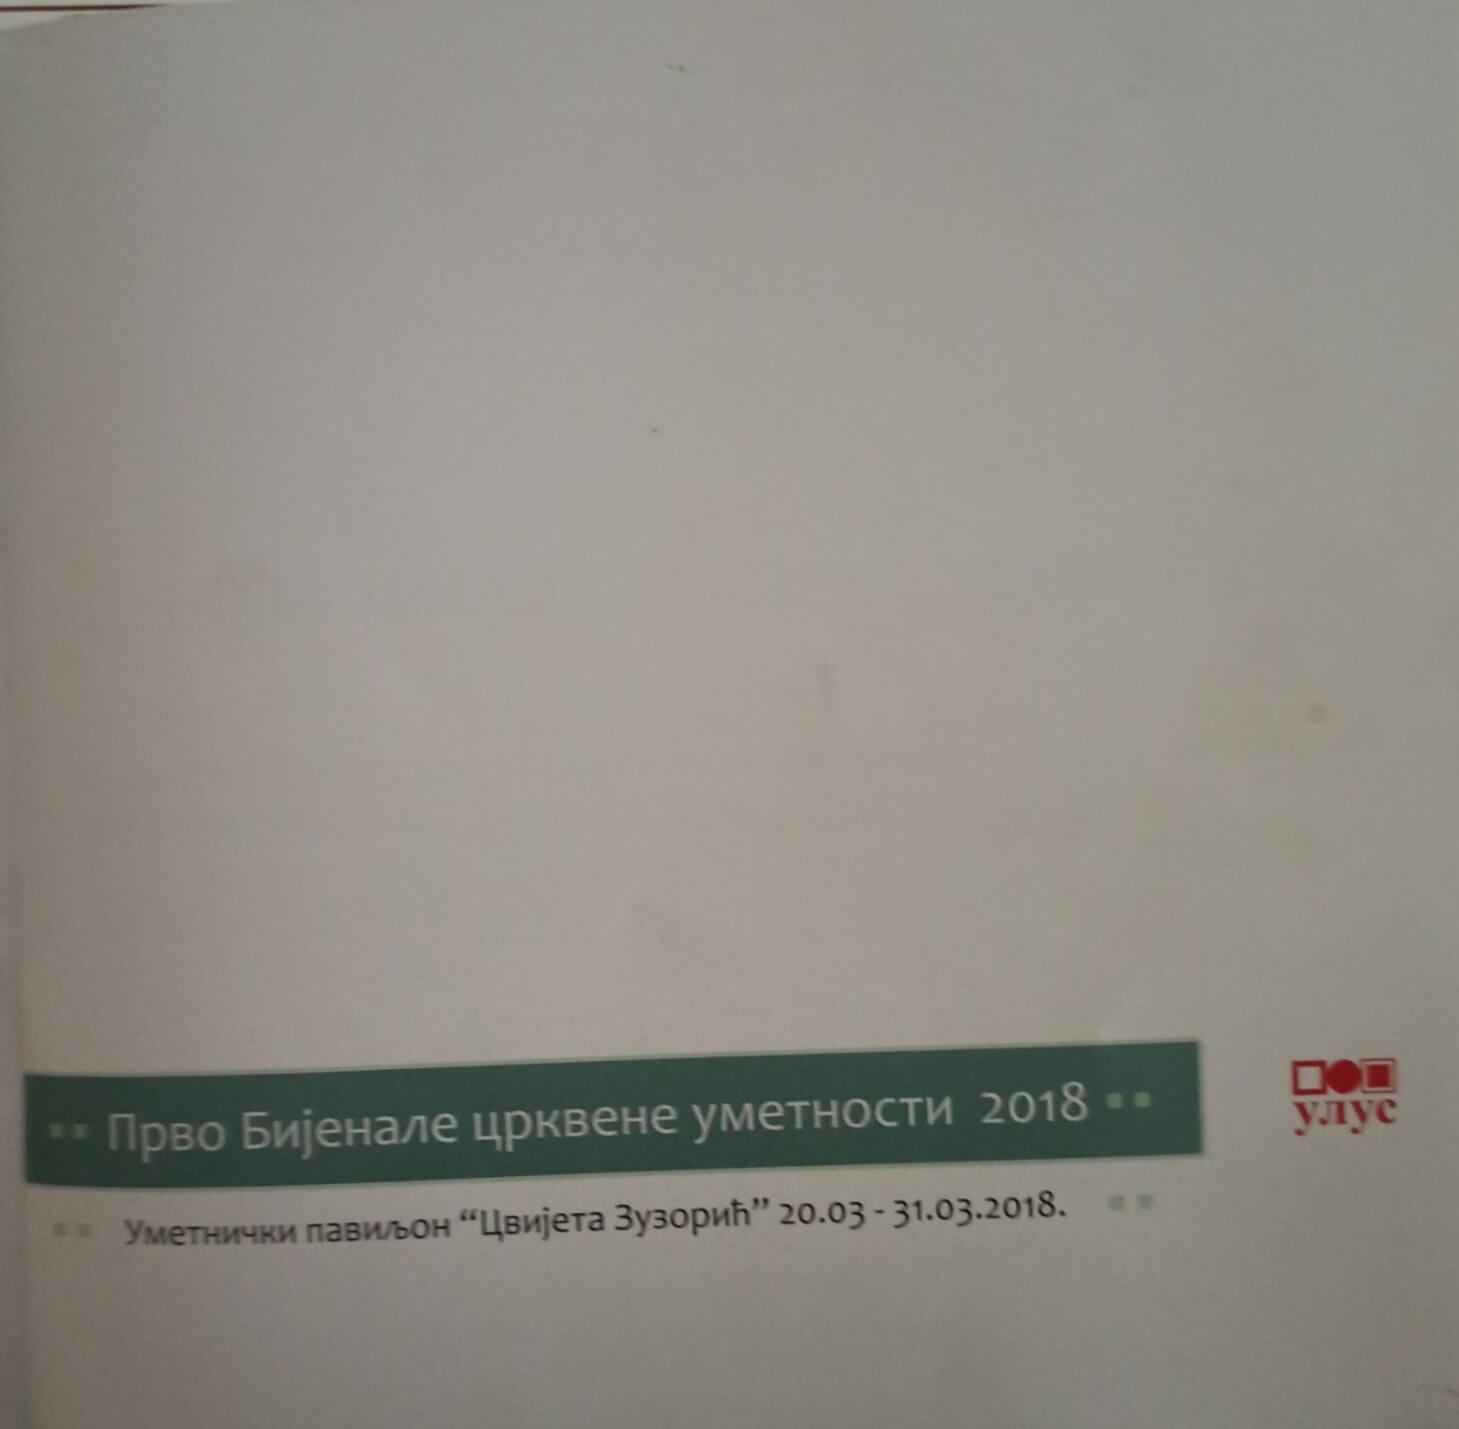 Ana Maljevic - Pravslavne ikone po narudžbini - Katalog izložbi 12